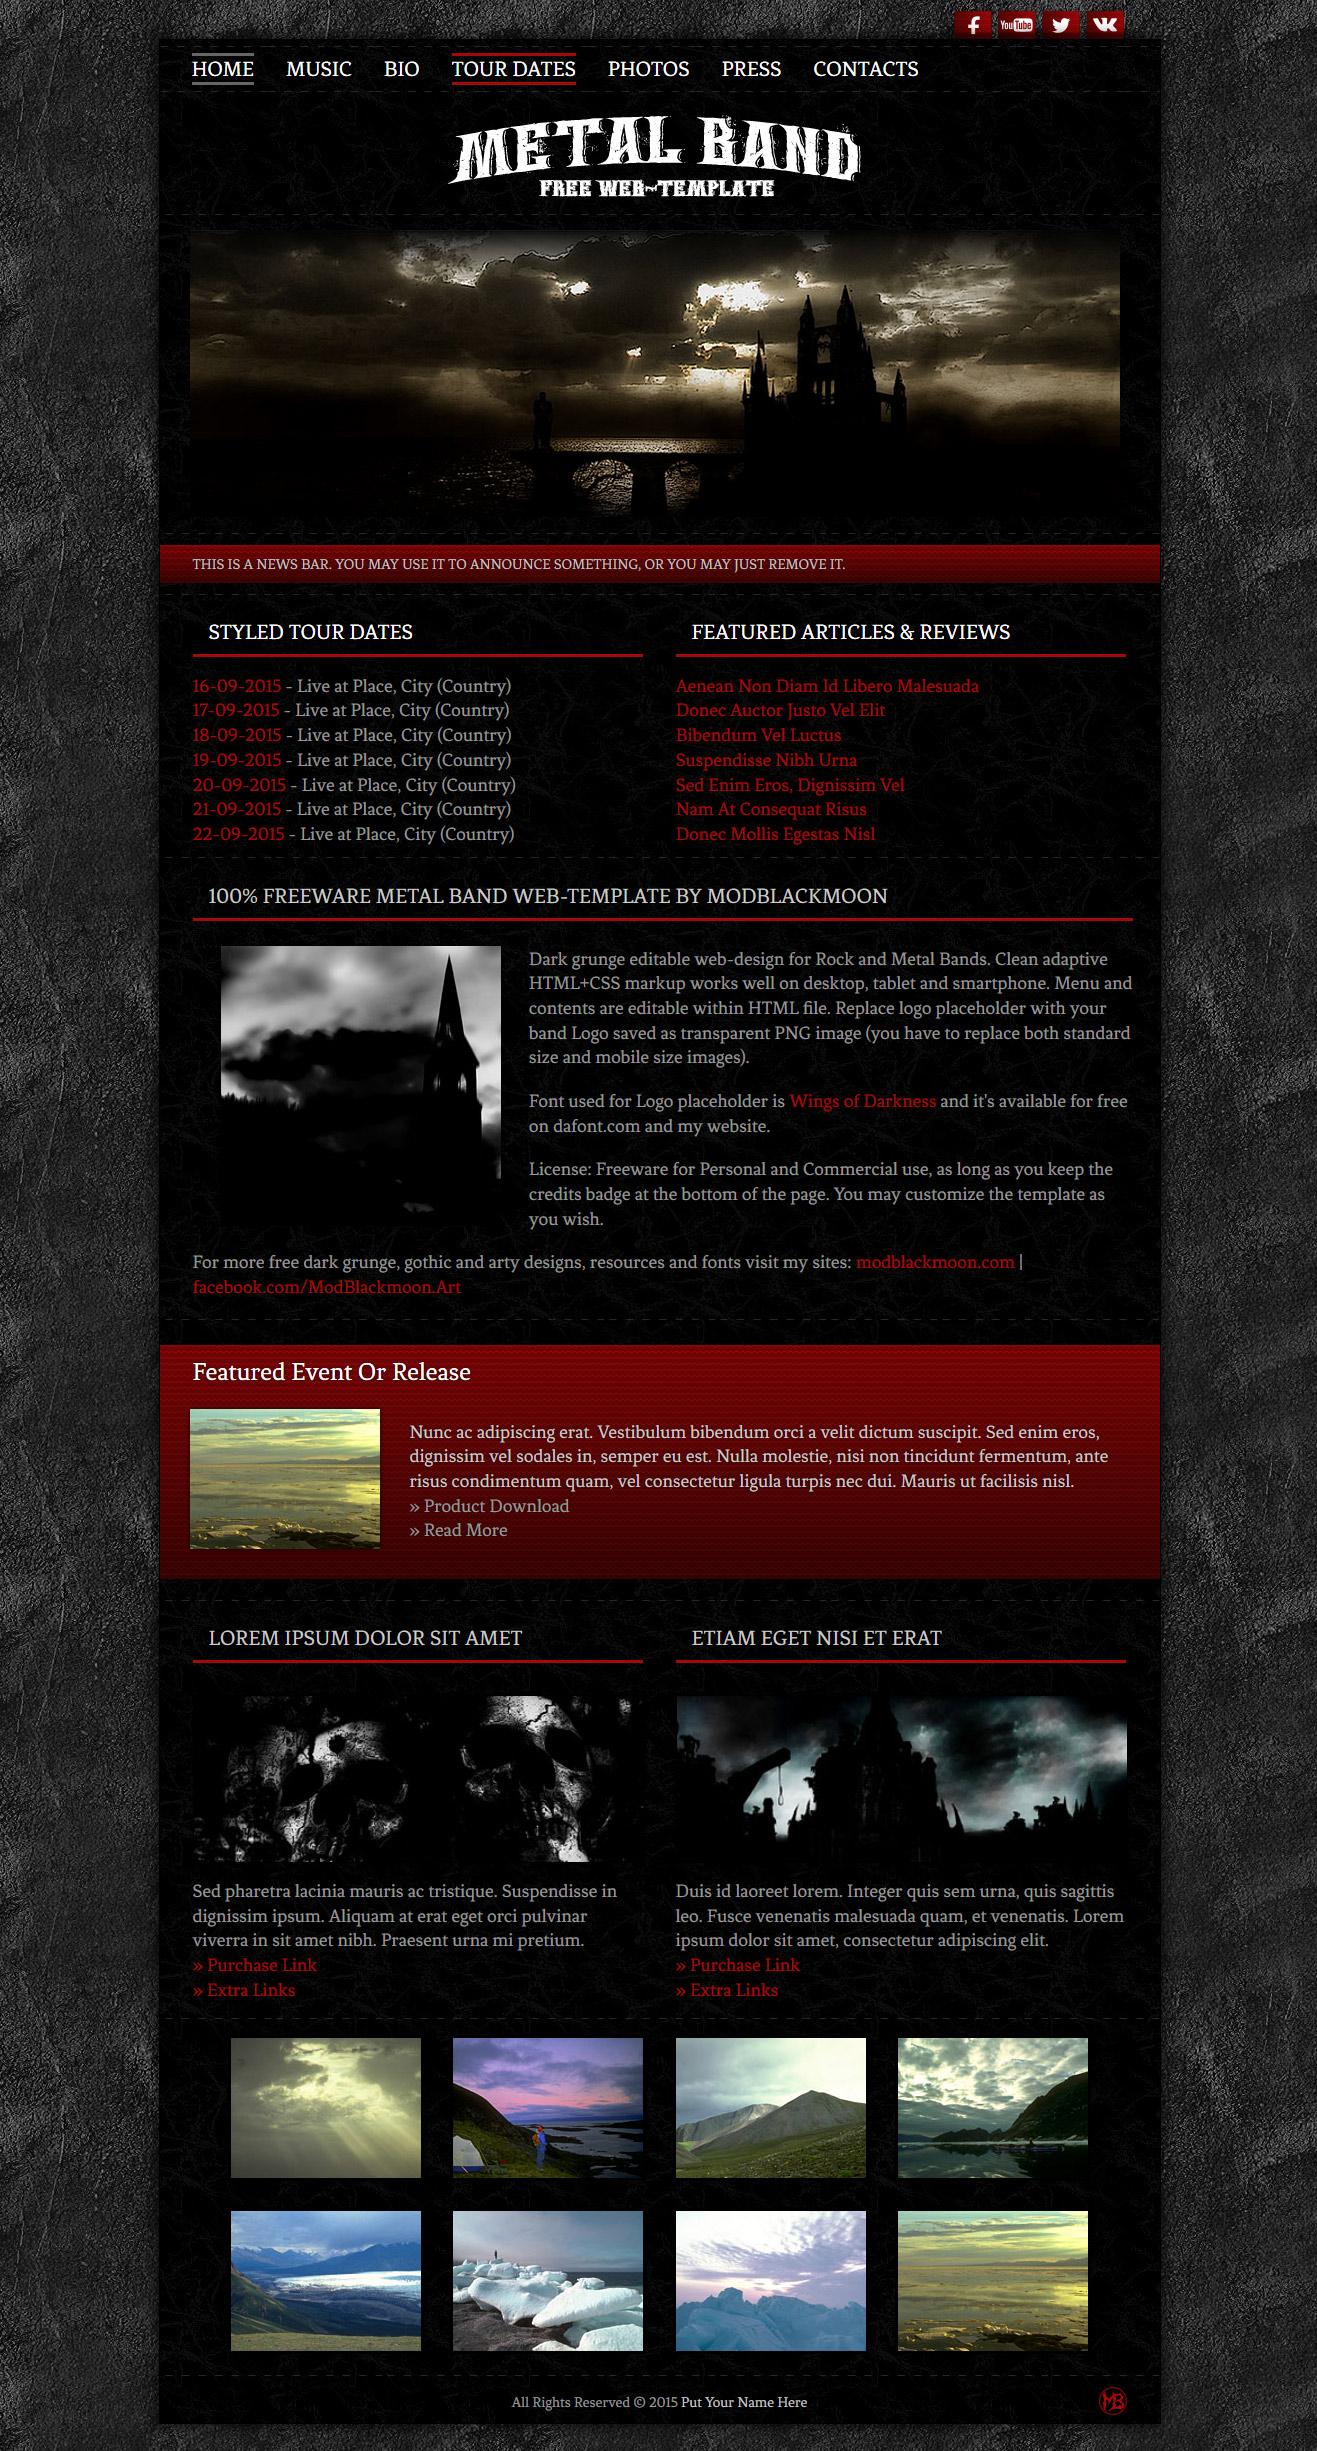 Metal Band Web-Template 026